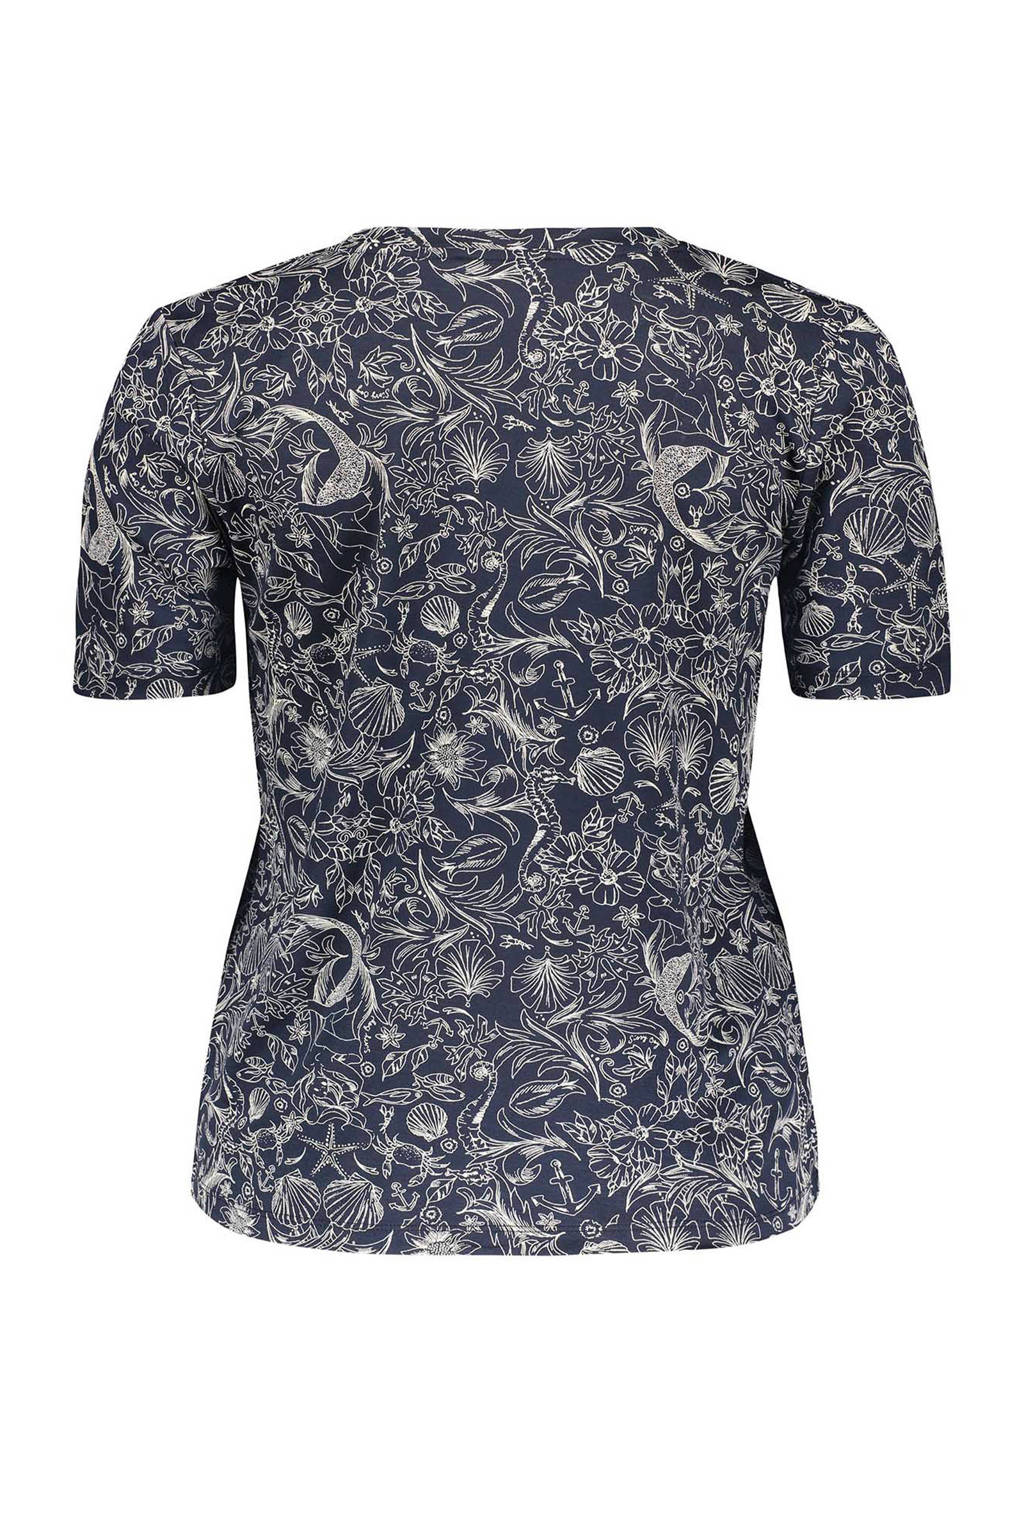 Sissy-Boy T-shirt met allover print marine, Marine